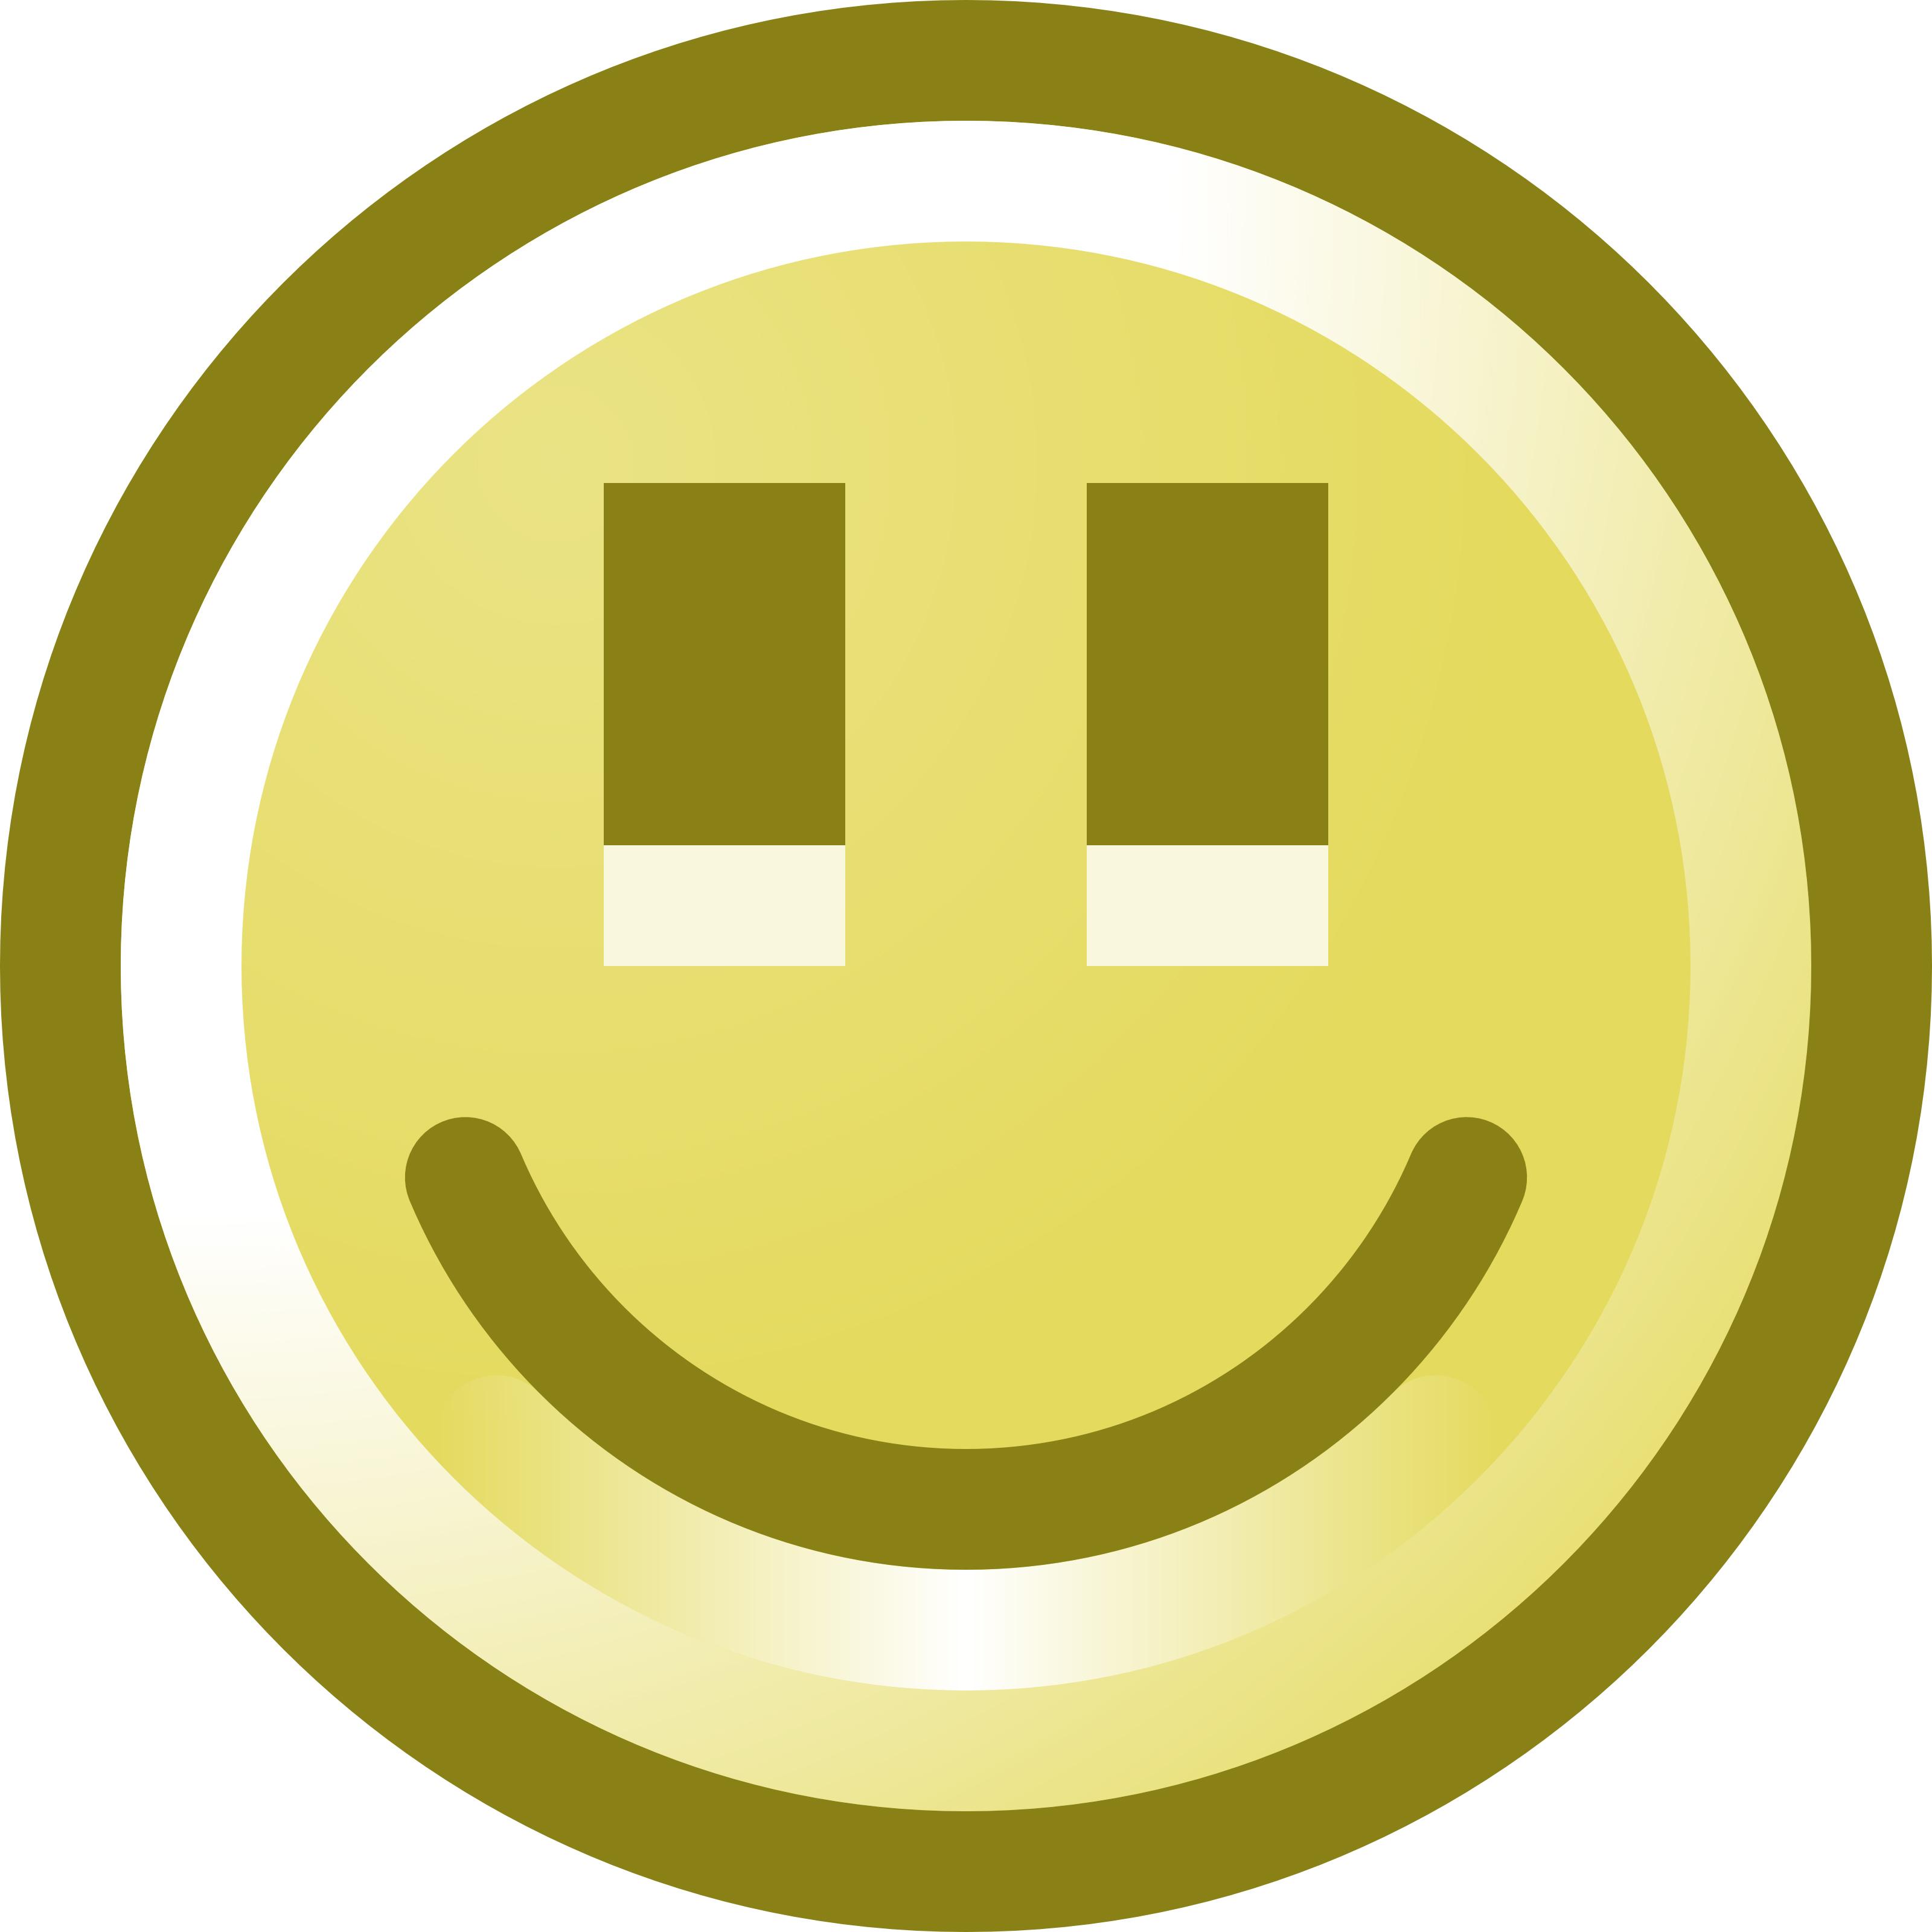 3200x3200 Free Smiling Smiley Face Clip Art Illustration Image